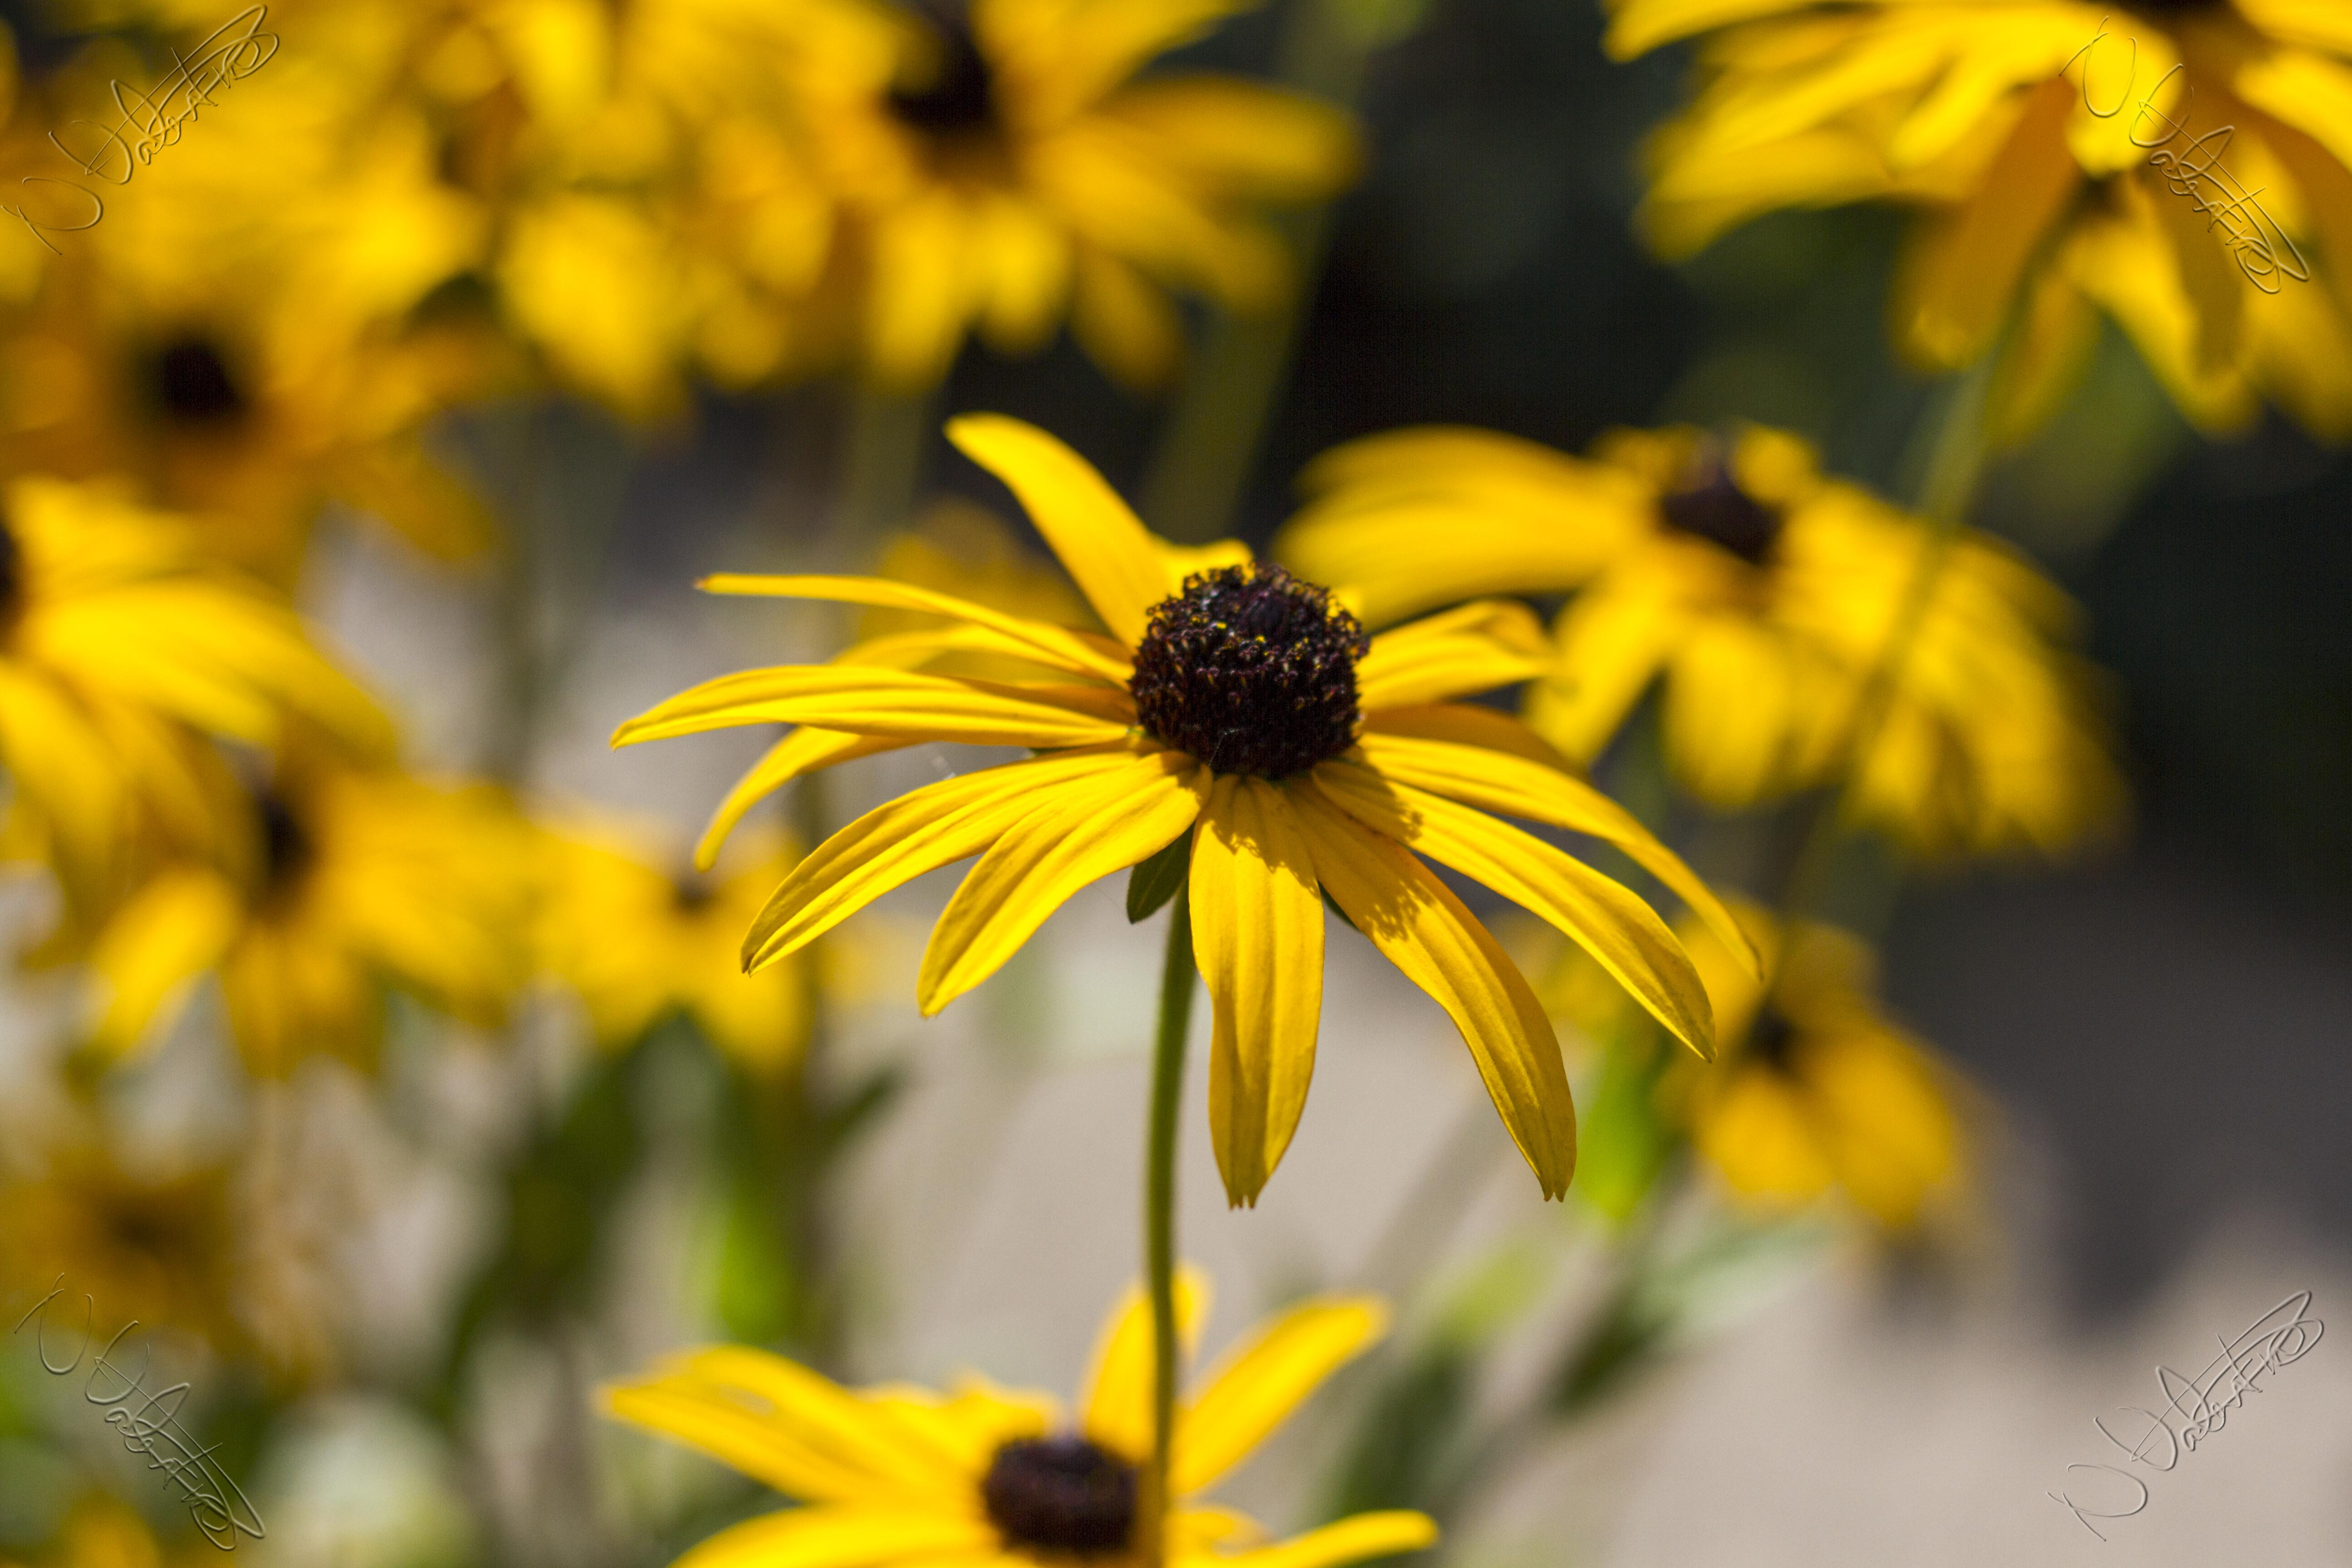 Free Images Nature Bokeh Meadow Flower Petal Pollen Autumn